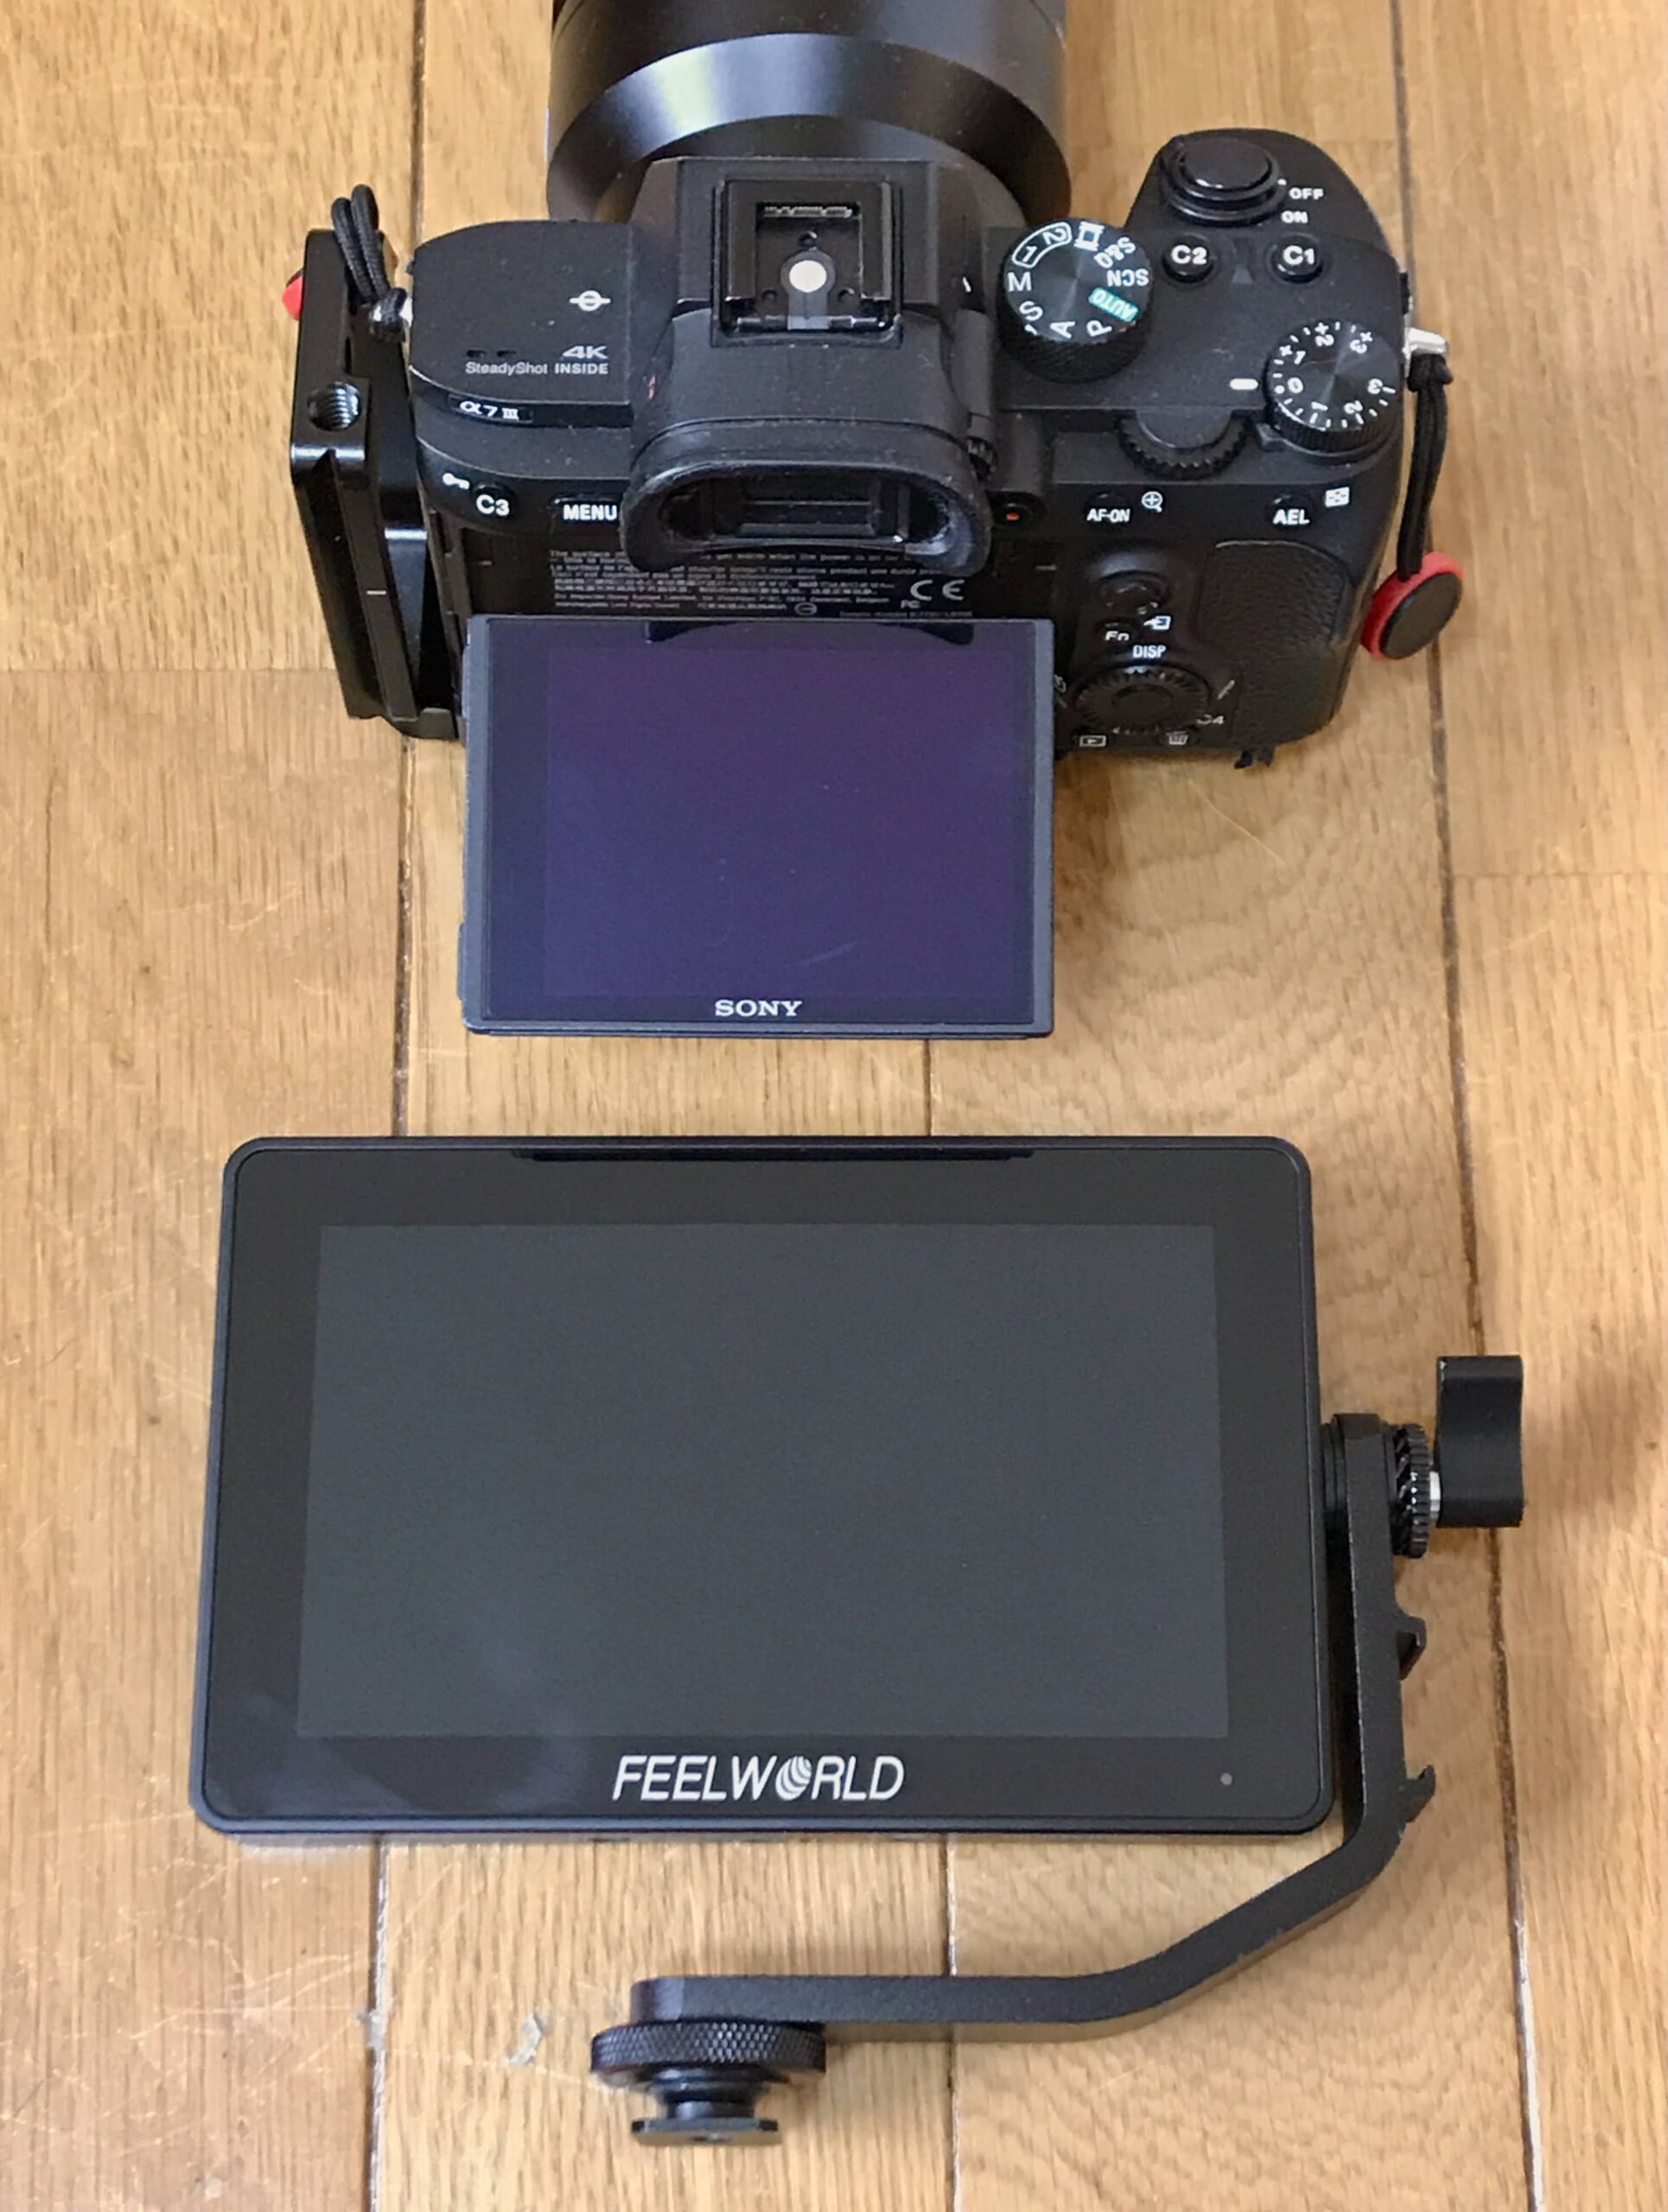 SONY α7iiiとFEELWORLD F6 PLUS 5.5インチ小型タッチスクリーン3D